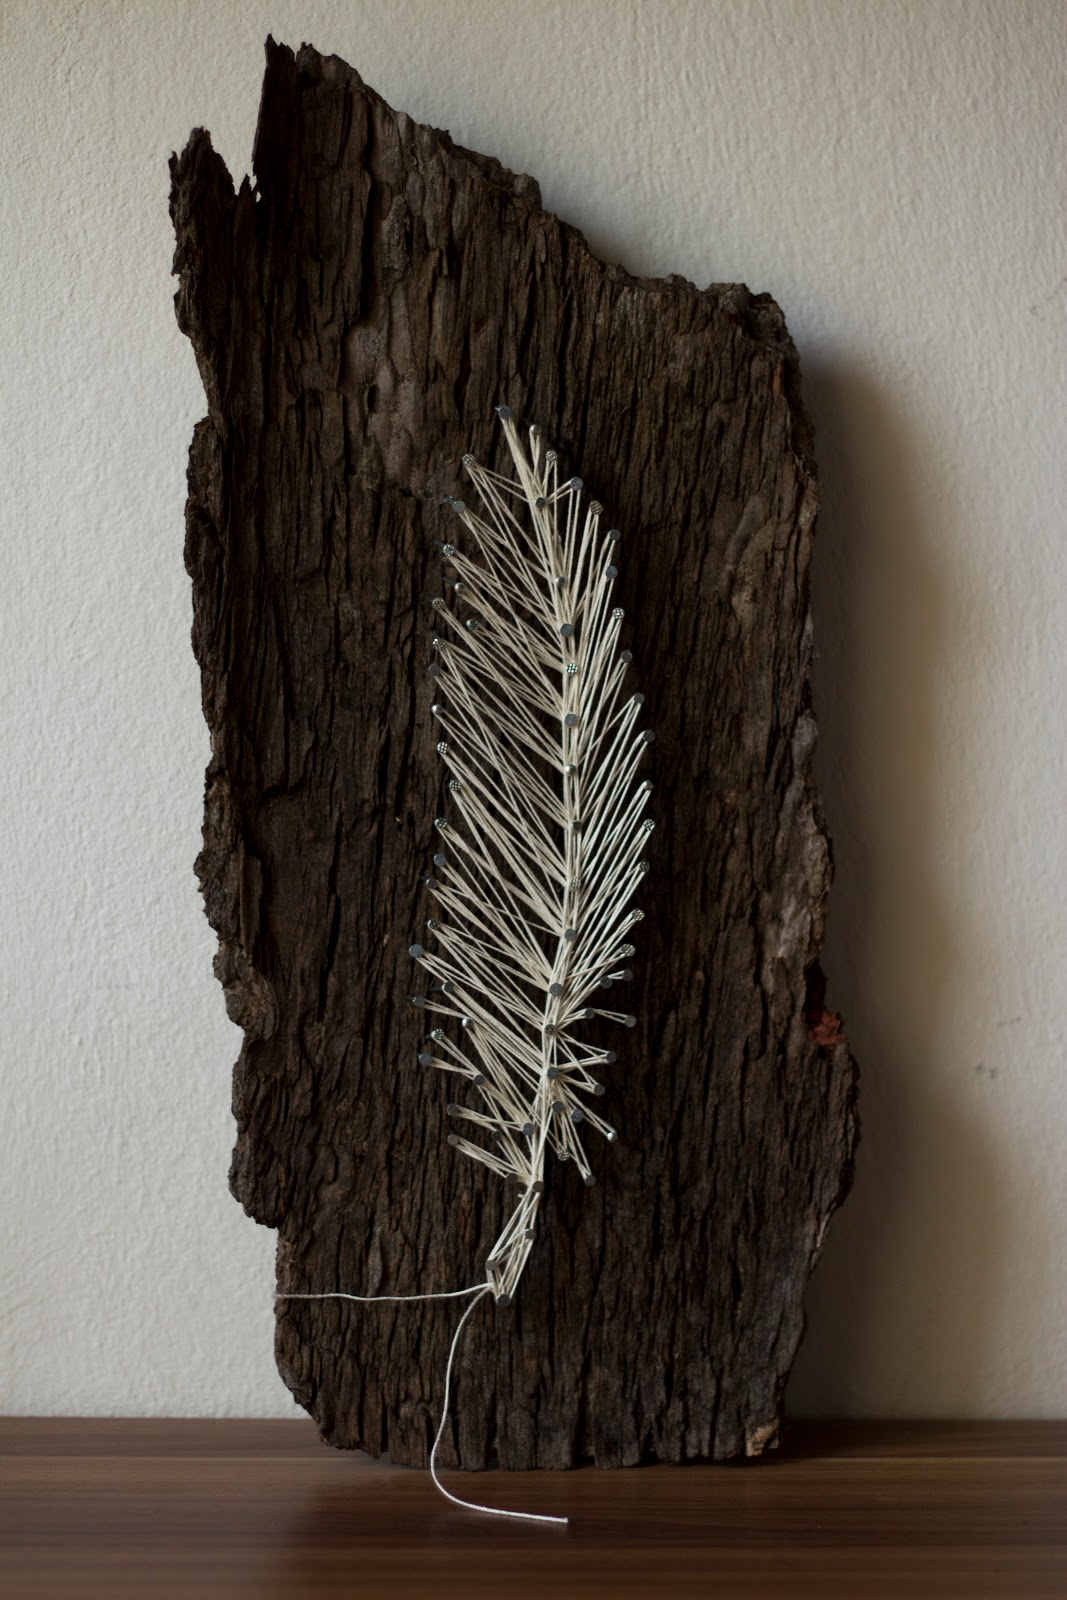 Fadenspiel Quot Von Der Natur Inspiriert Quot Handmade Kultur